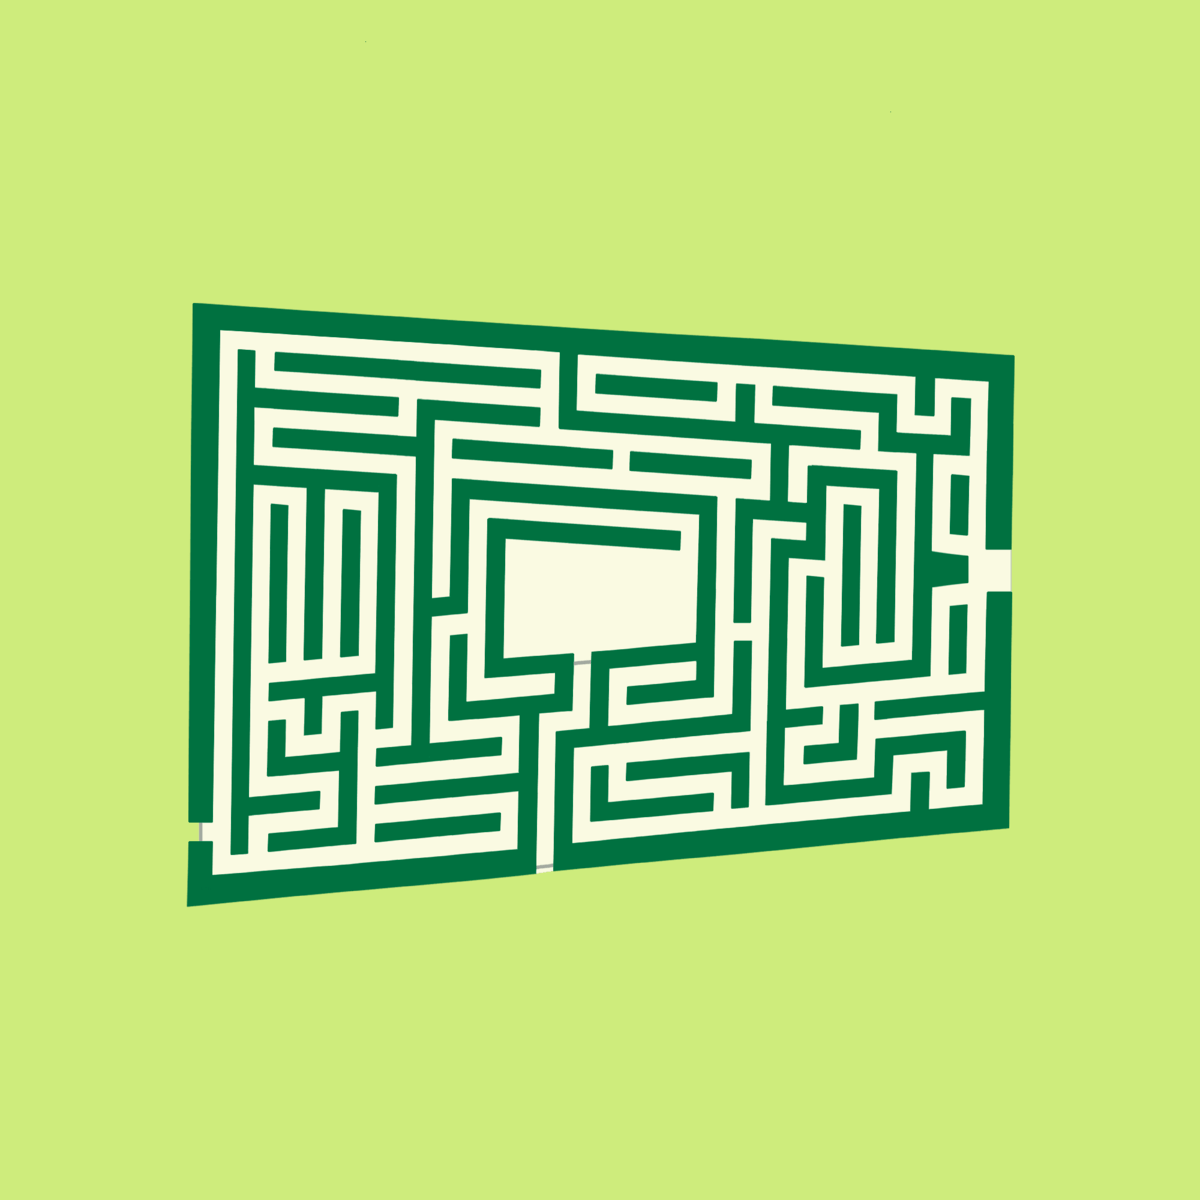 maze - Simple English Wiktionary